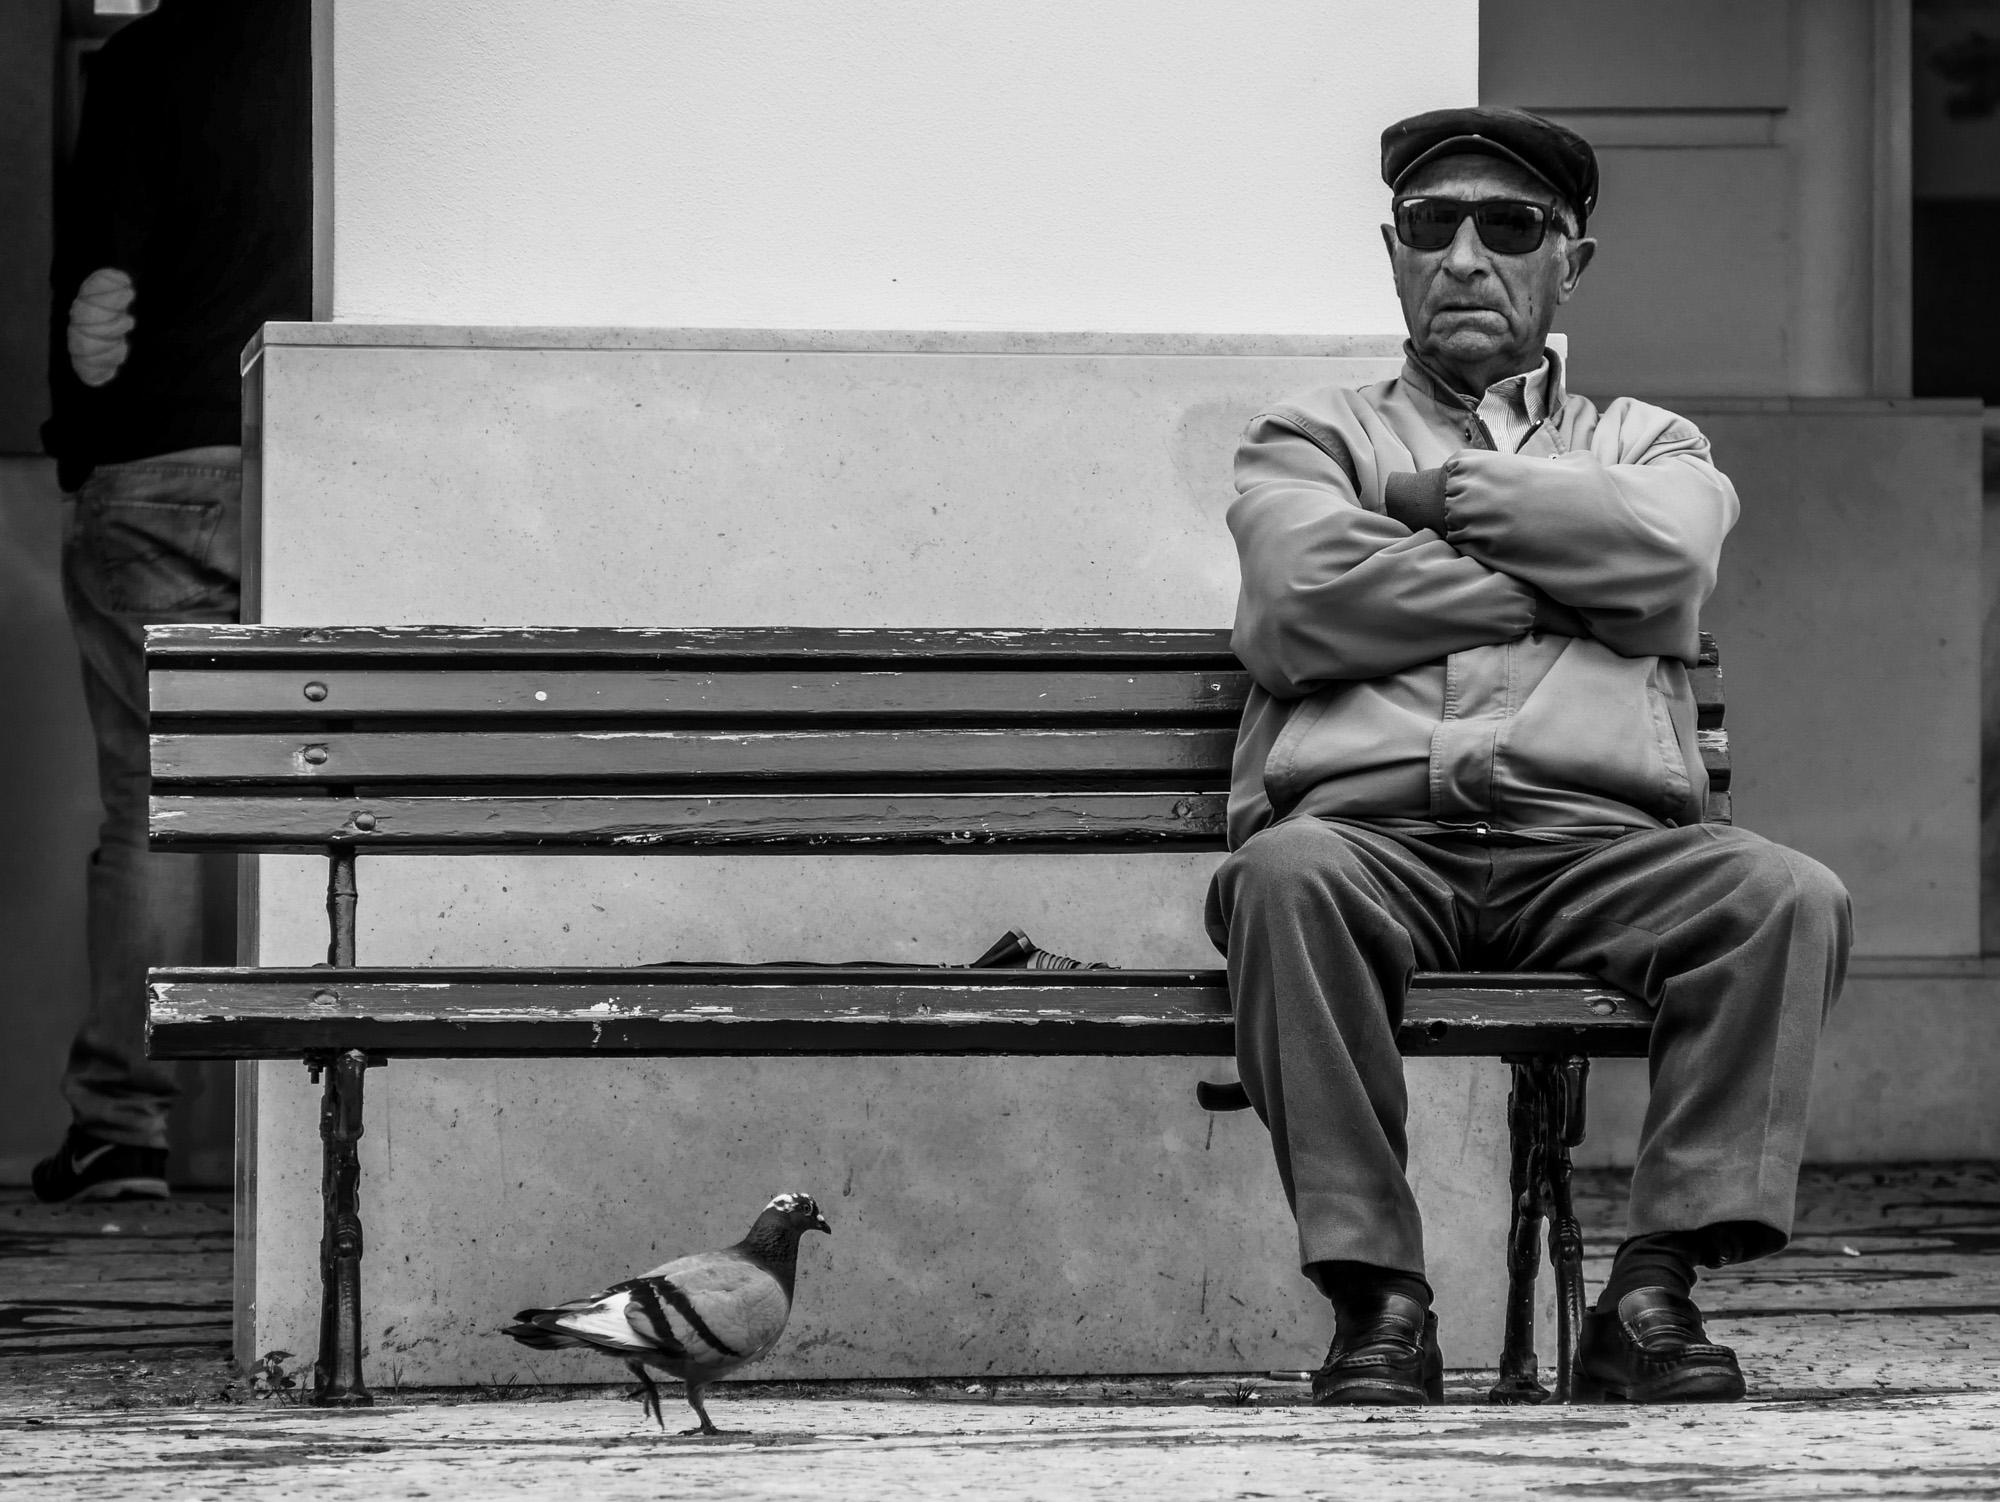 Man on the bench | Aveiro Portugal